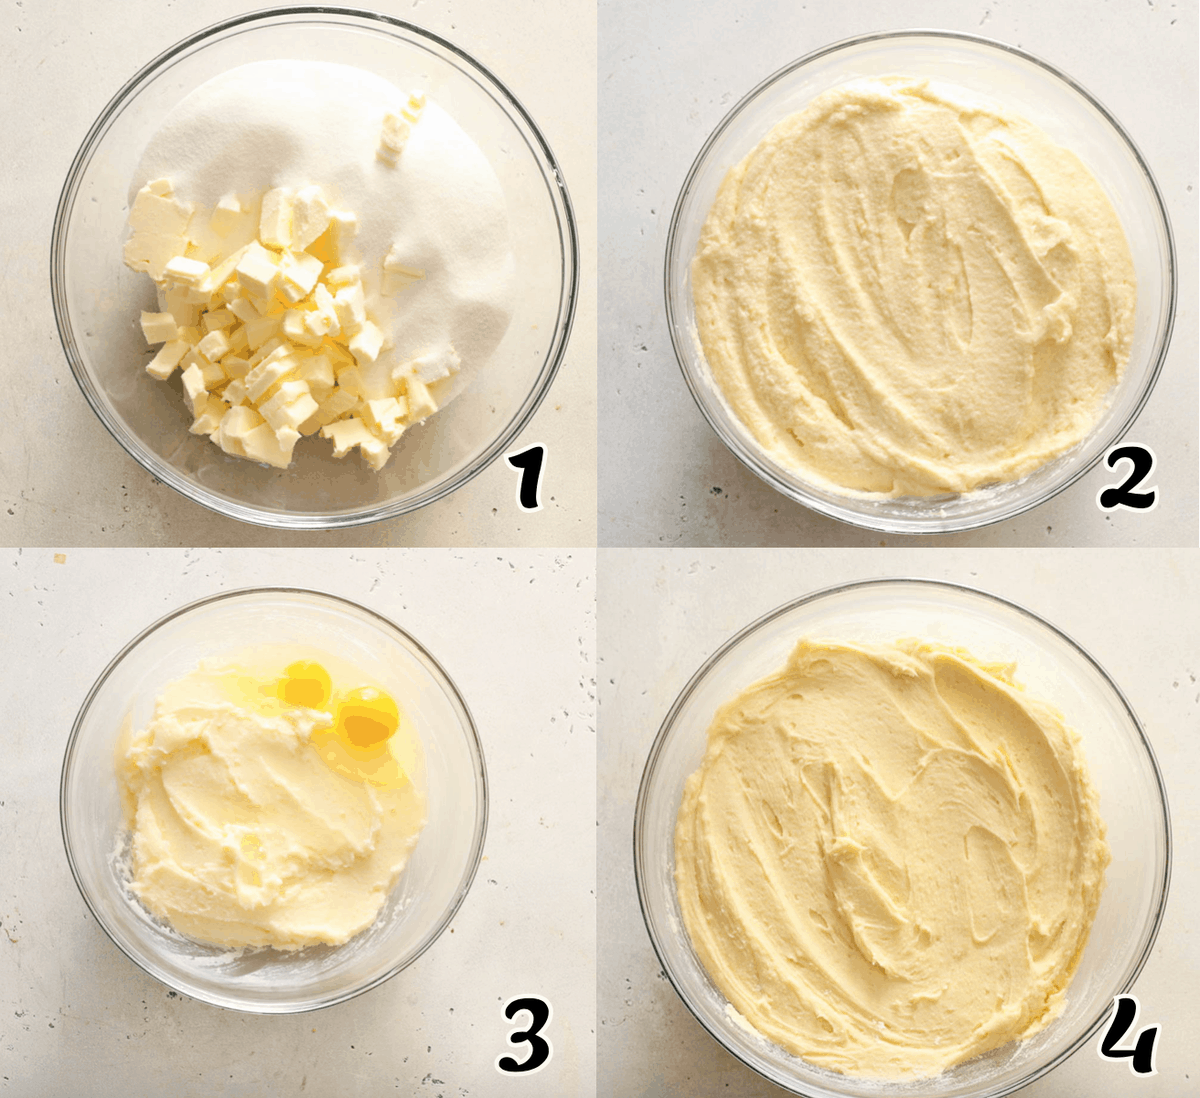 7UP Pound Cake Instructions 1-4